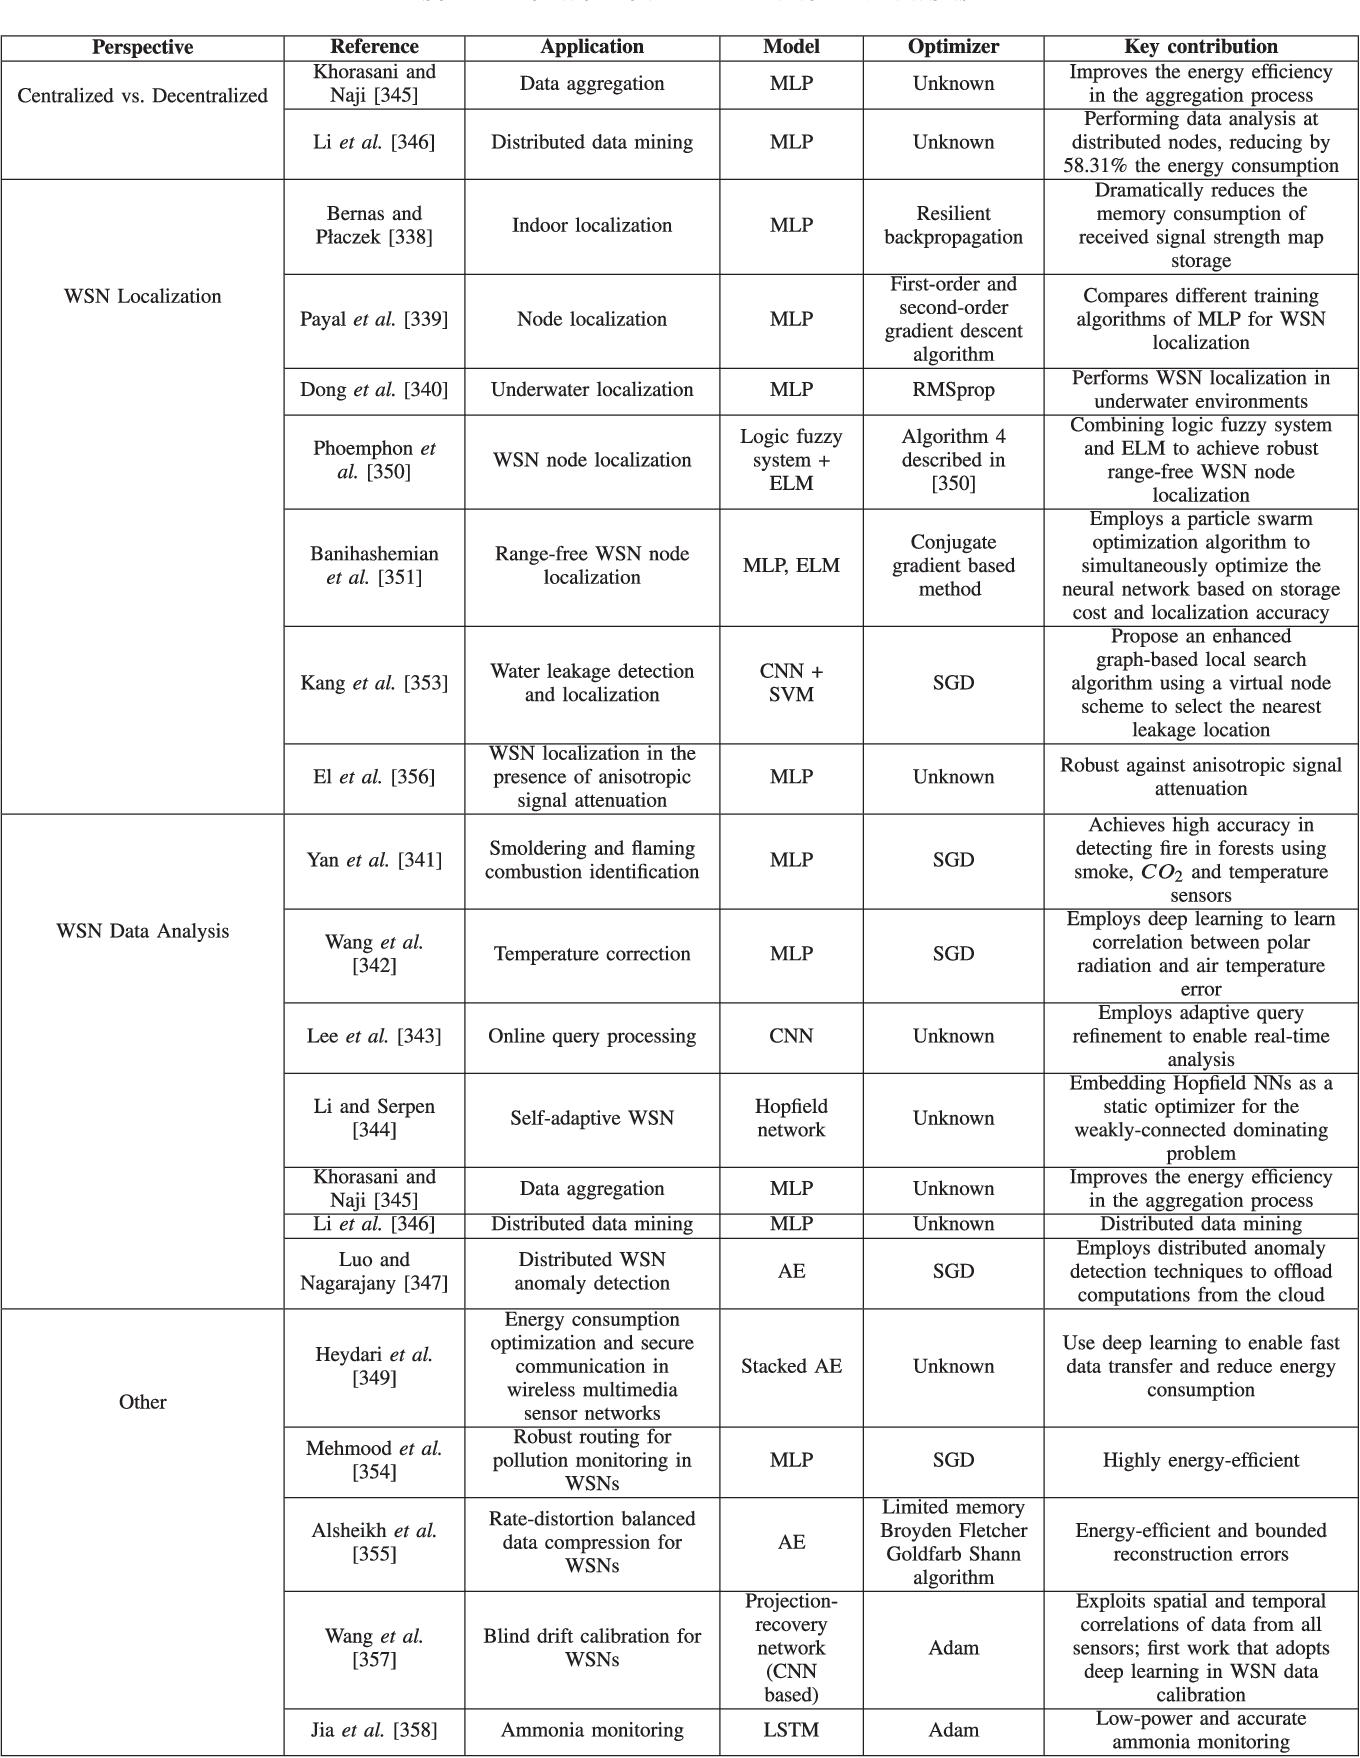 table XV